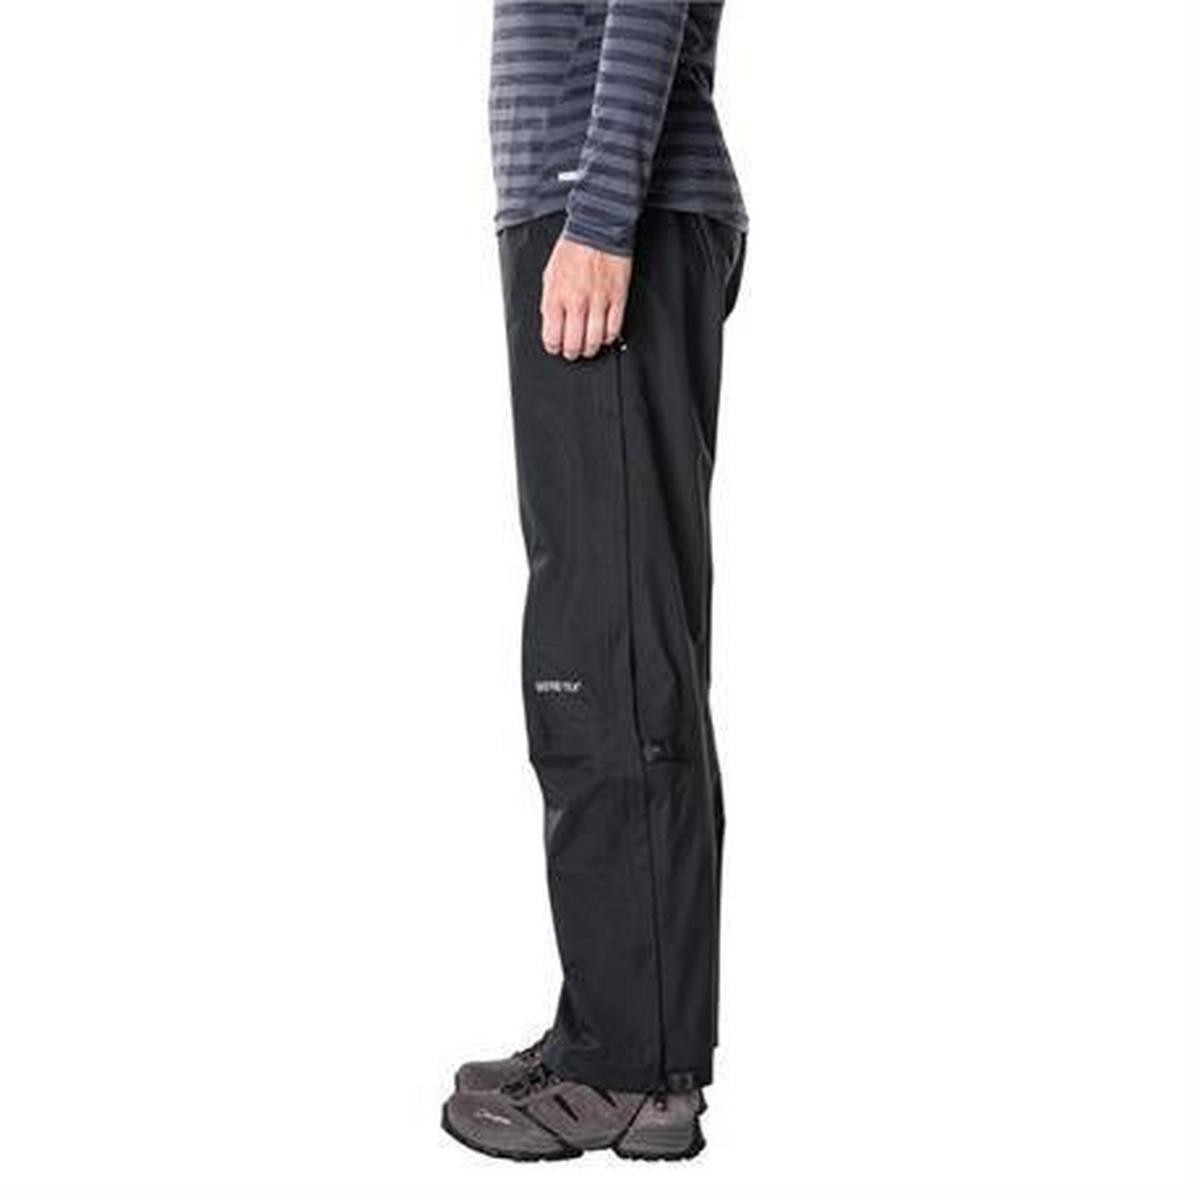 Berghaus WATERPROOF Overtrousers Women's Paclite Pant SHORT Leg Black